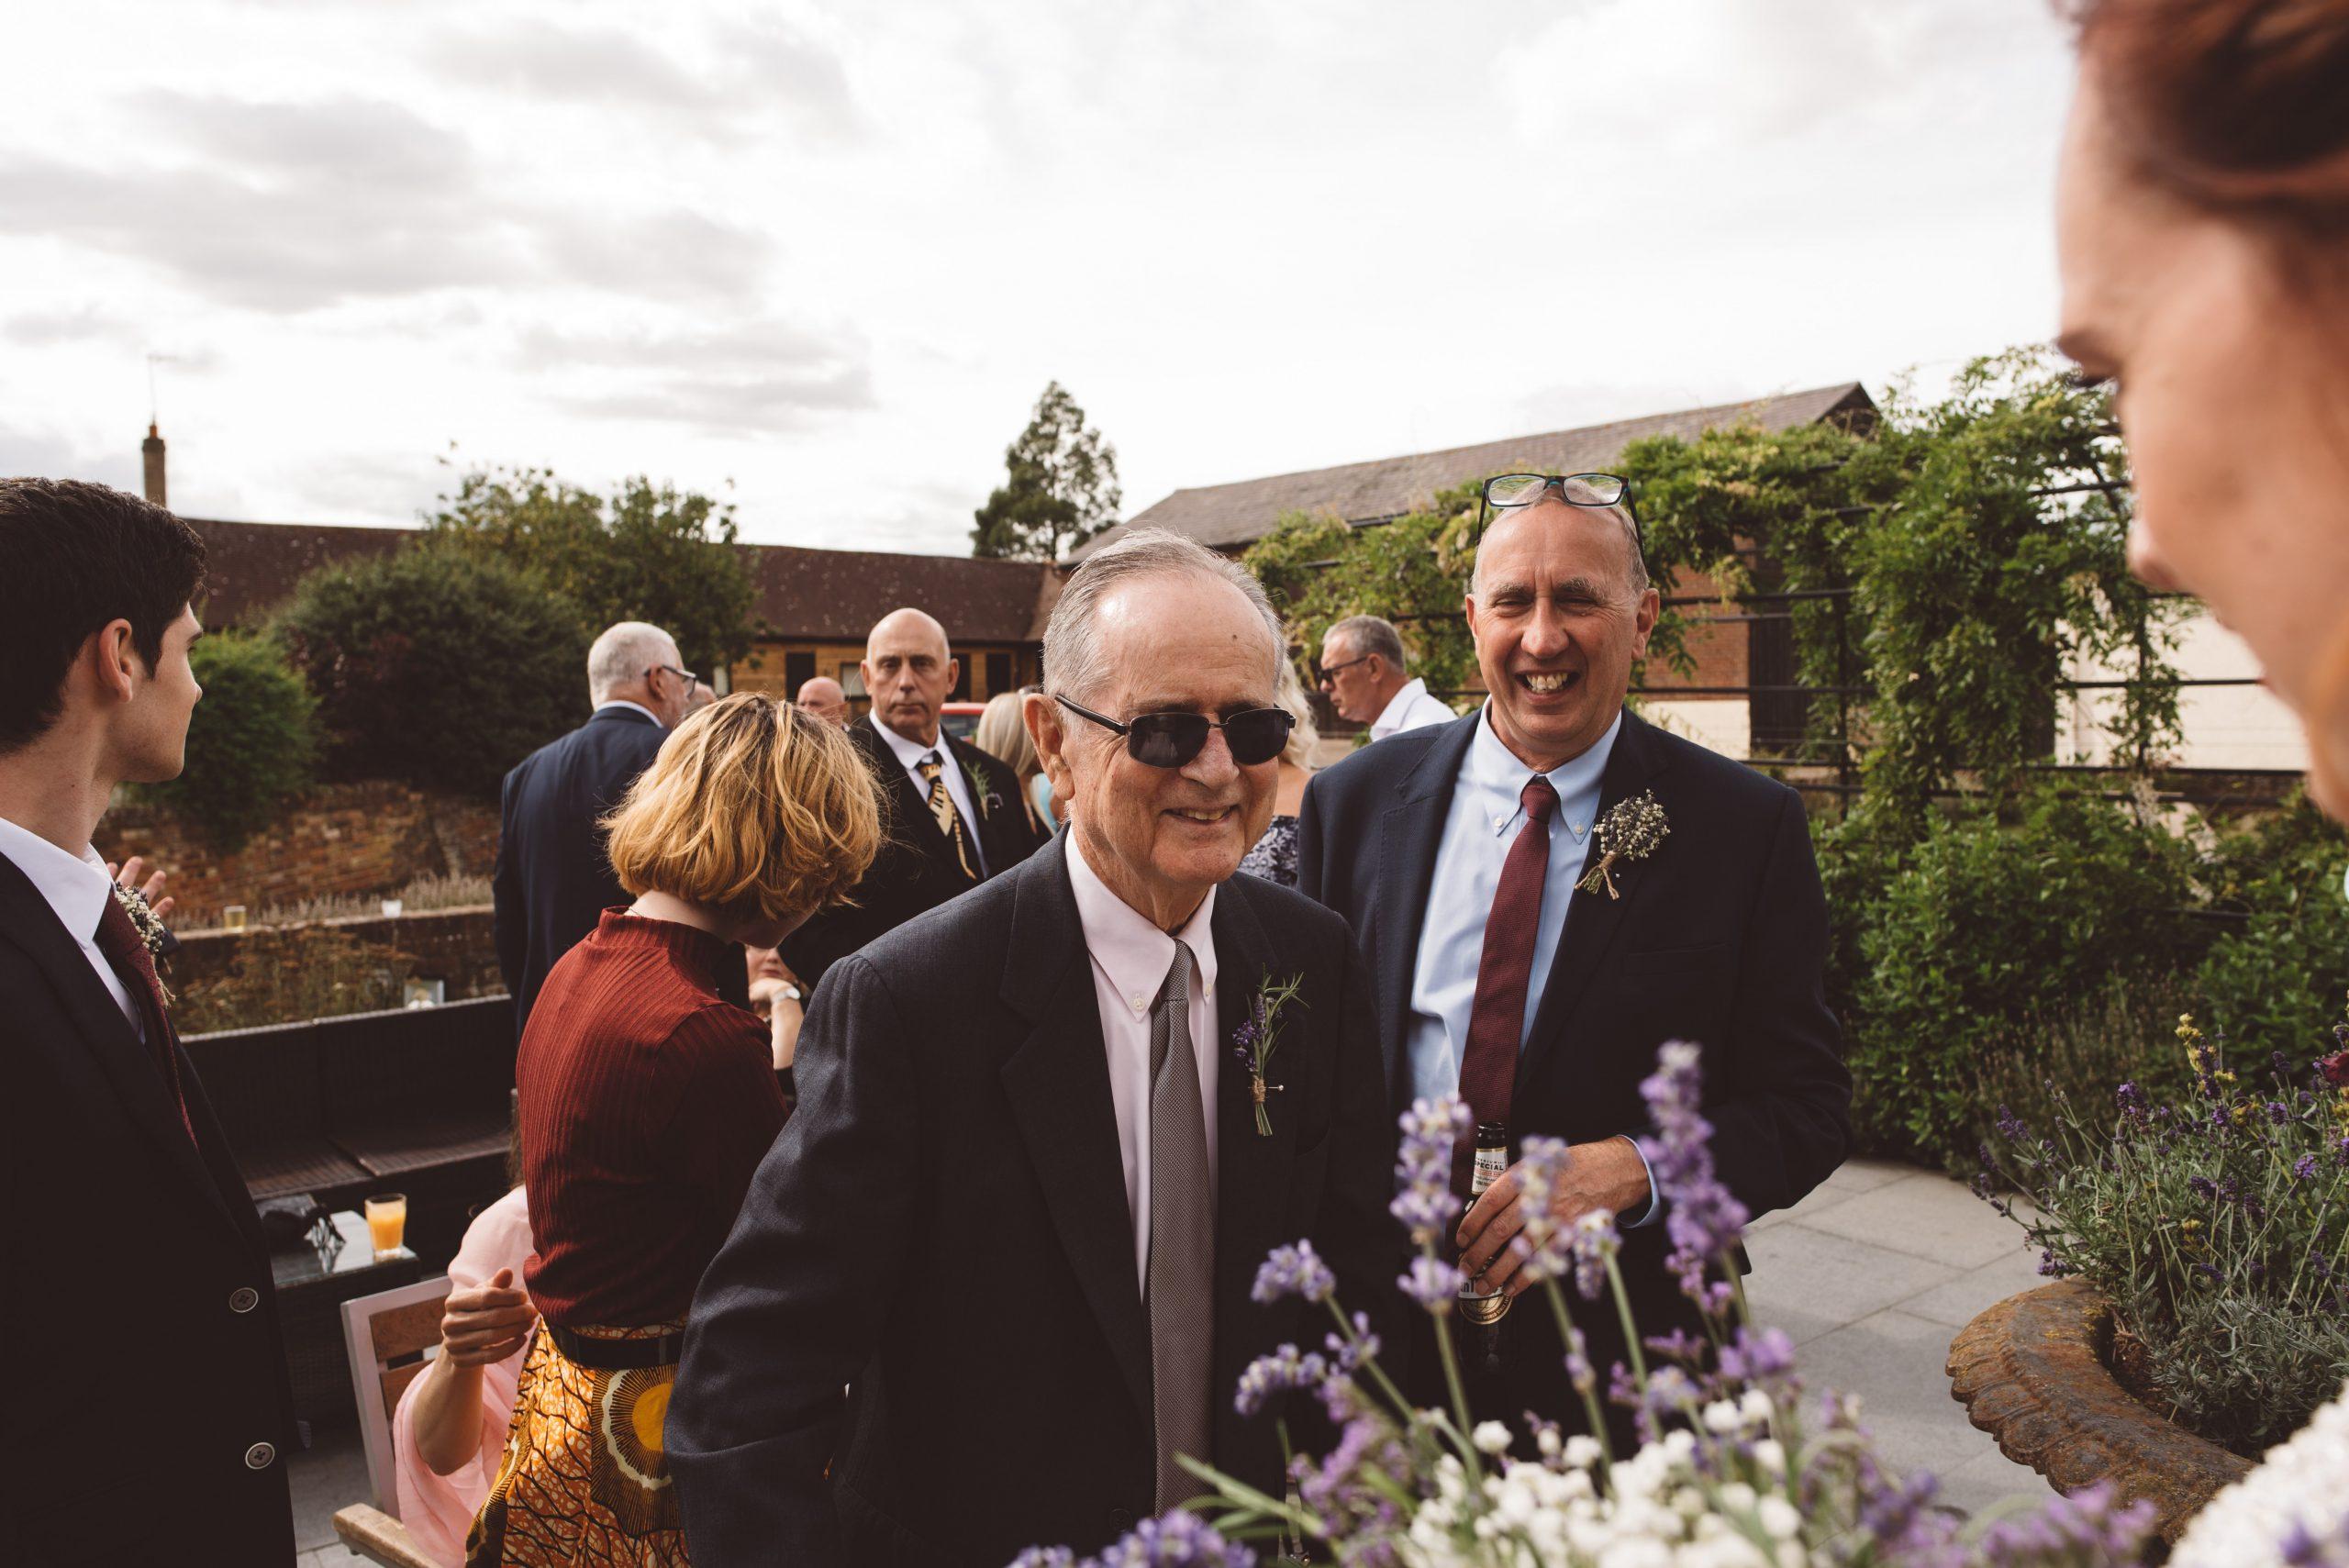 proud grandparent at wedding in Hertfordshire